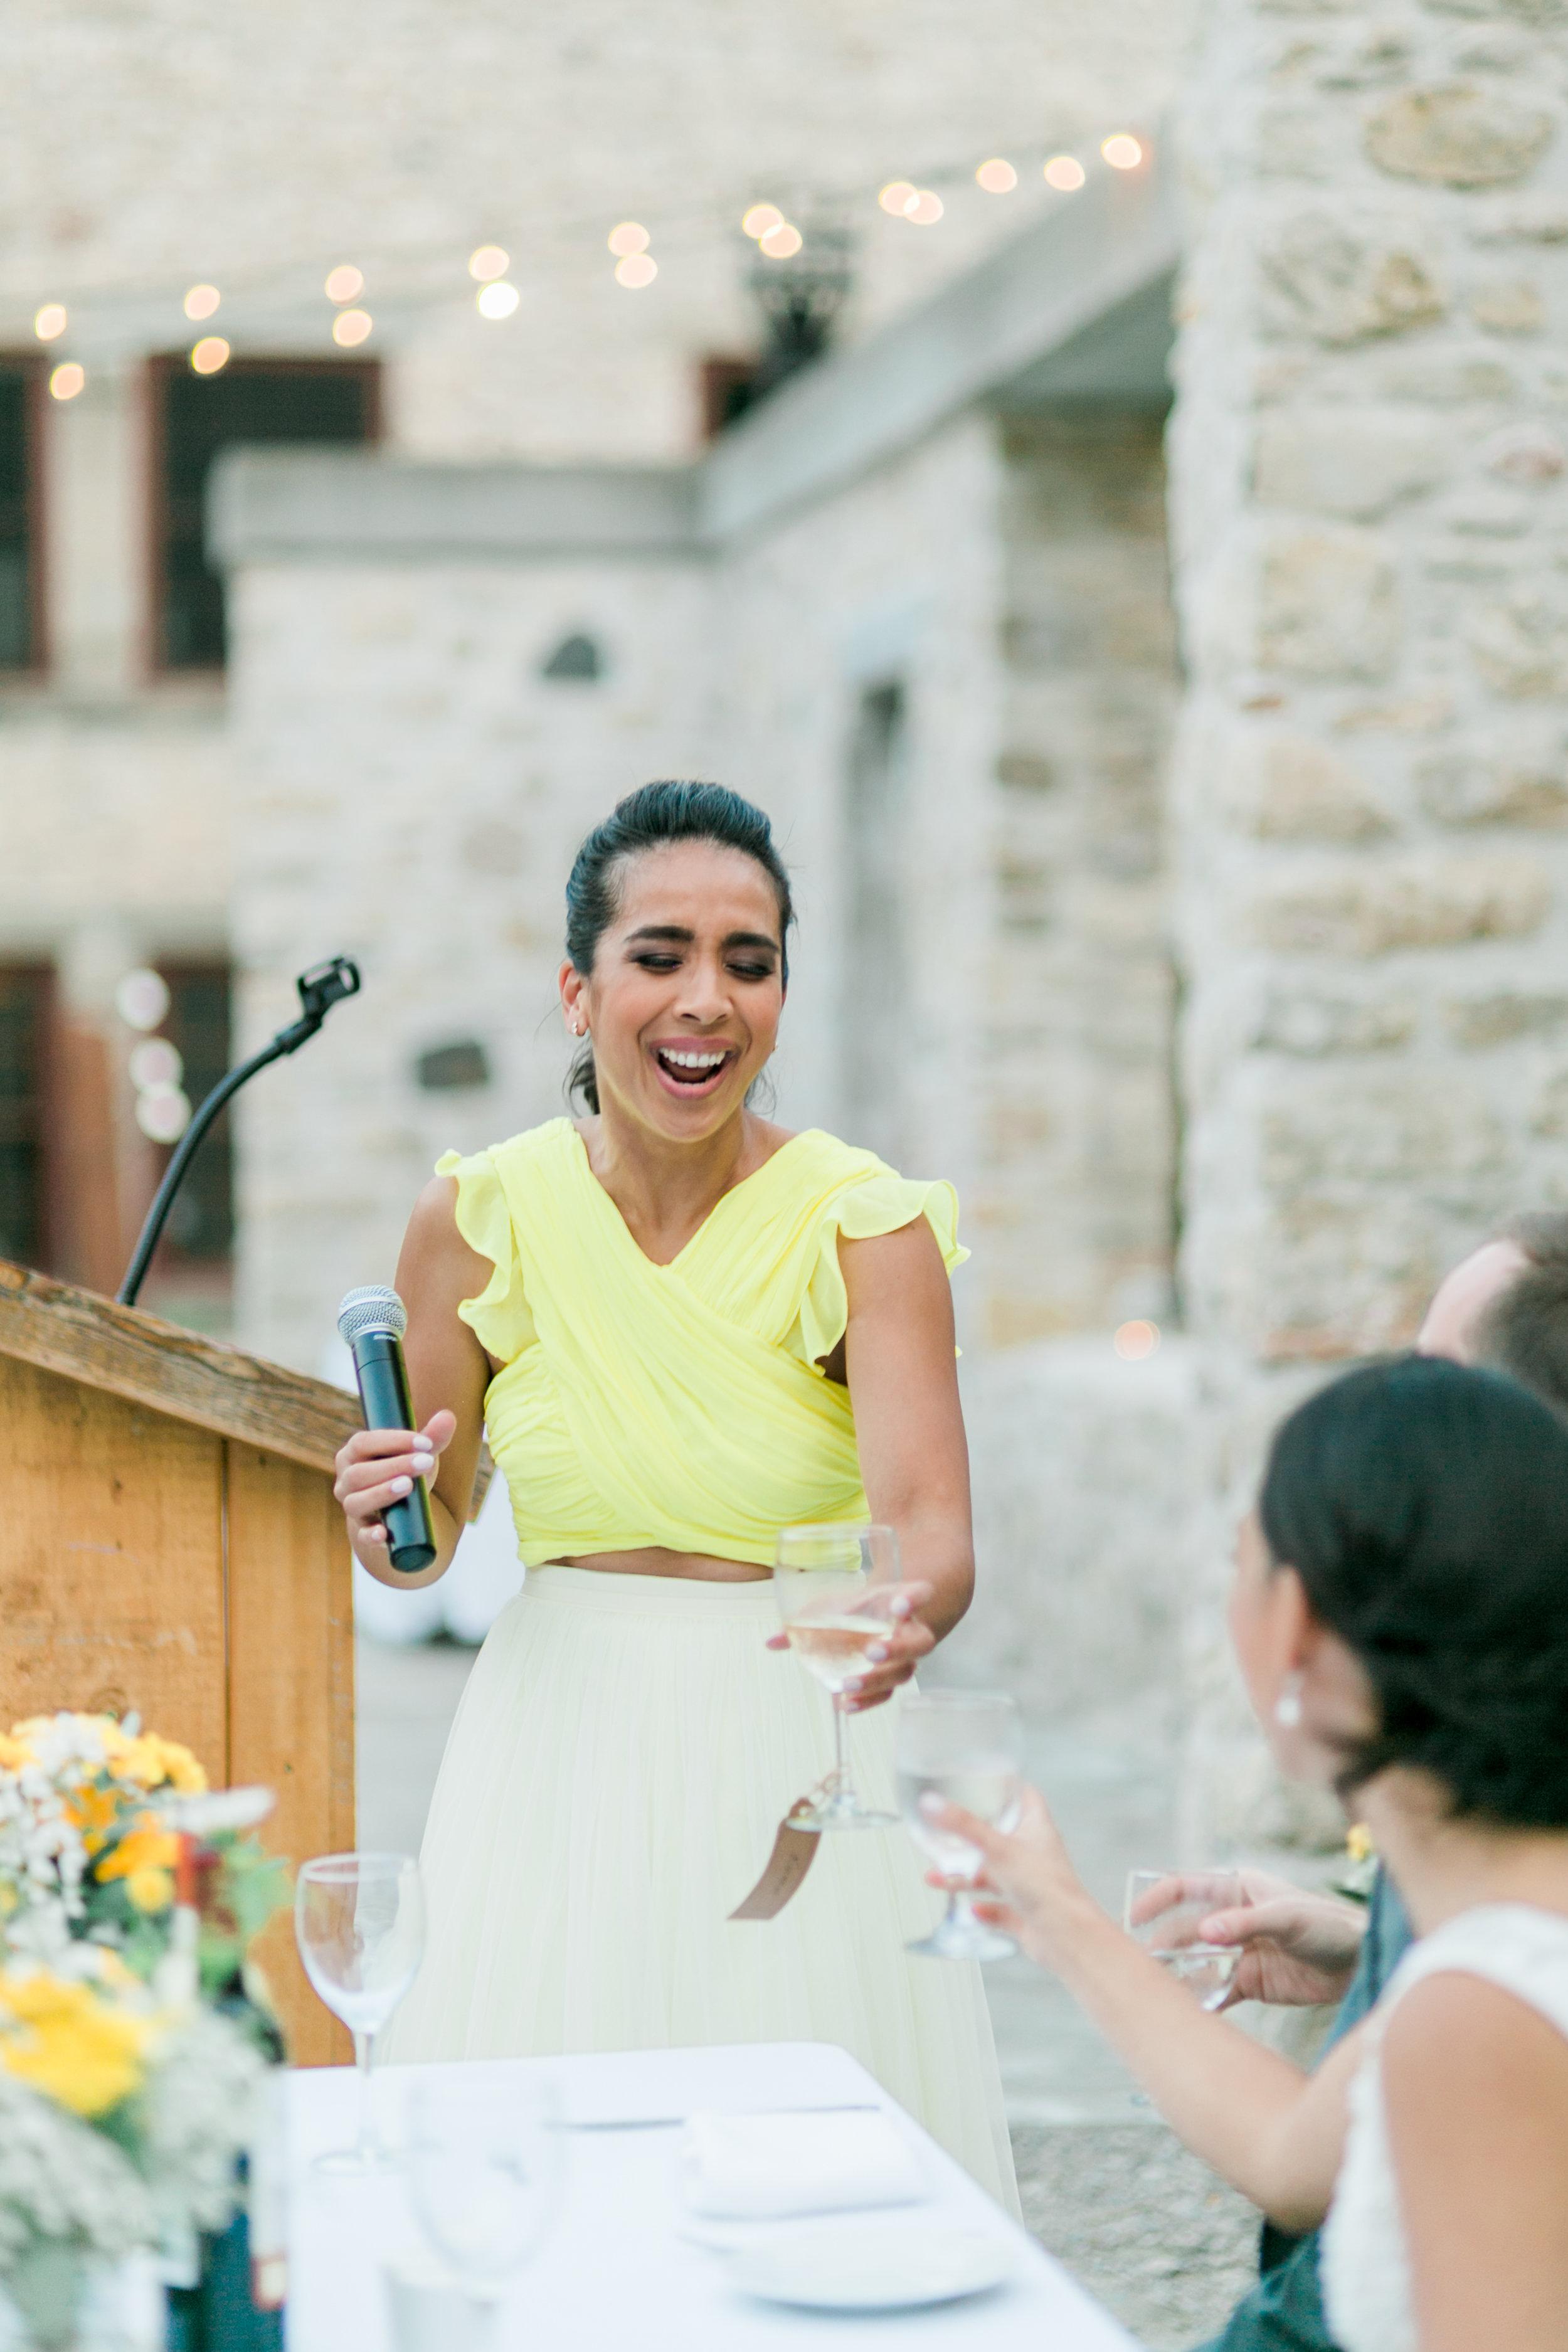 Alton Mills Wedding - Reception-68.jpg